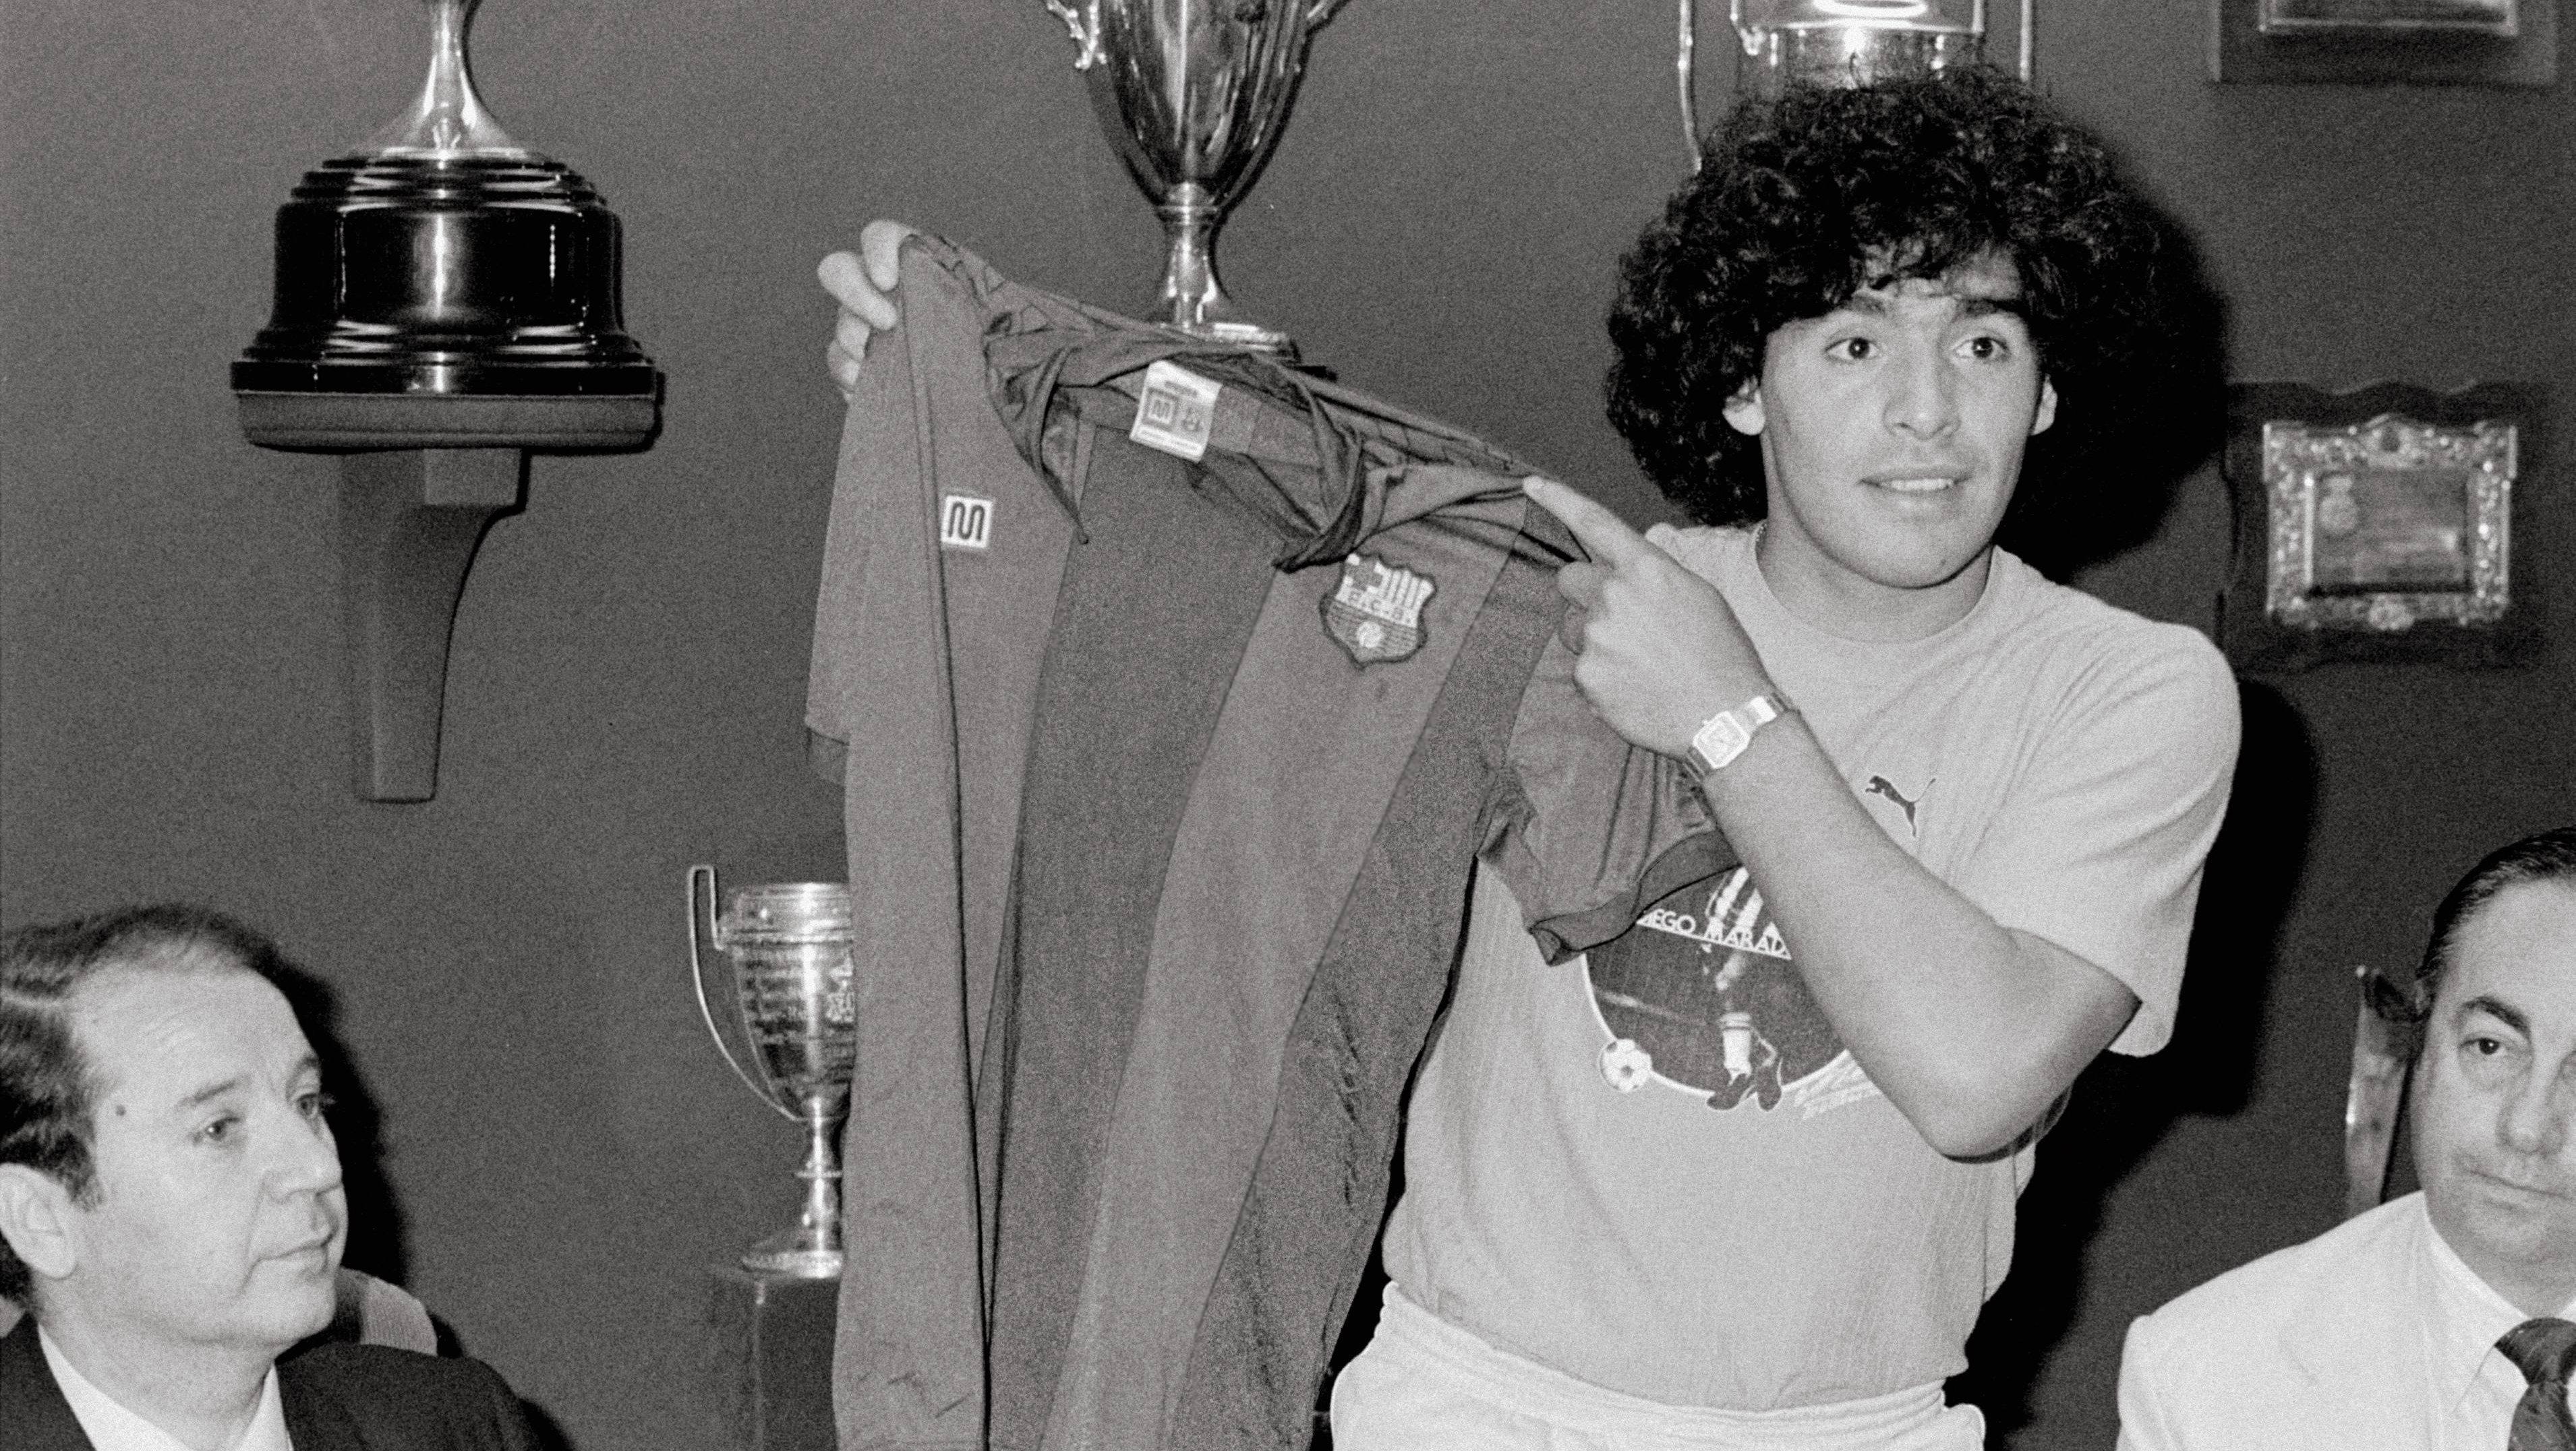 Presentation of Maradona in F.C. Barcelona The Argentinian football star Diego Armando 'Pelusa' Maradona shows the F.C. Barcelona´s singlet in the presence of Jose Luis Nunez, president of the football club, during a press conference